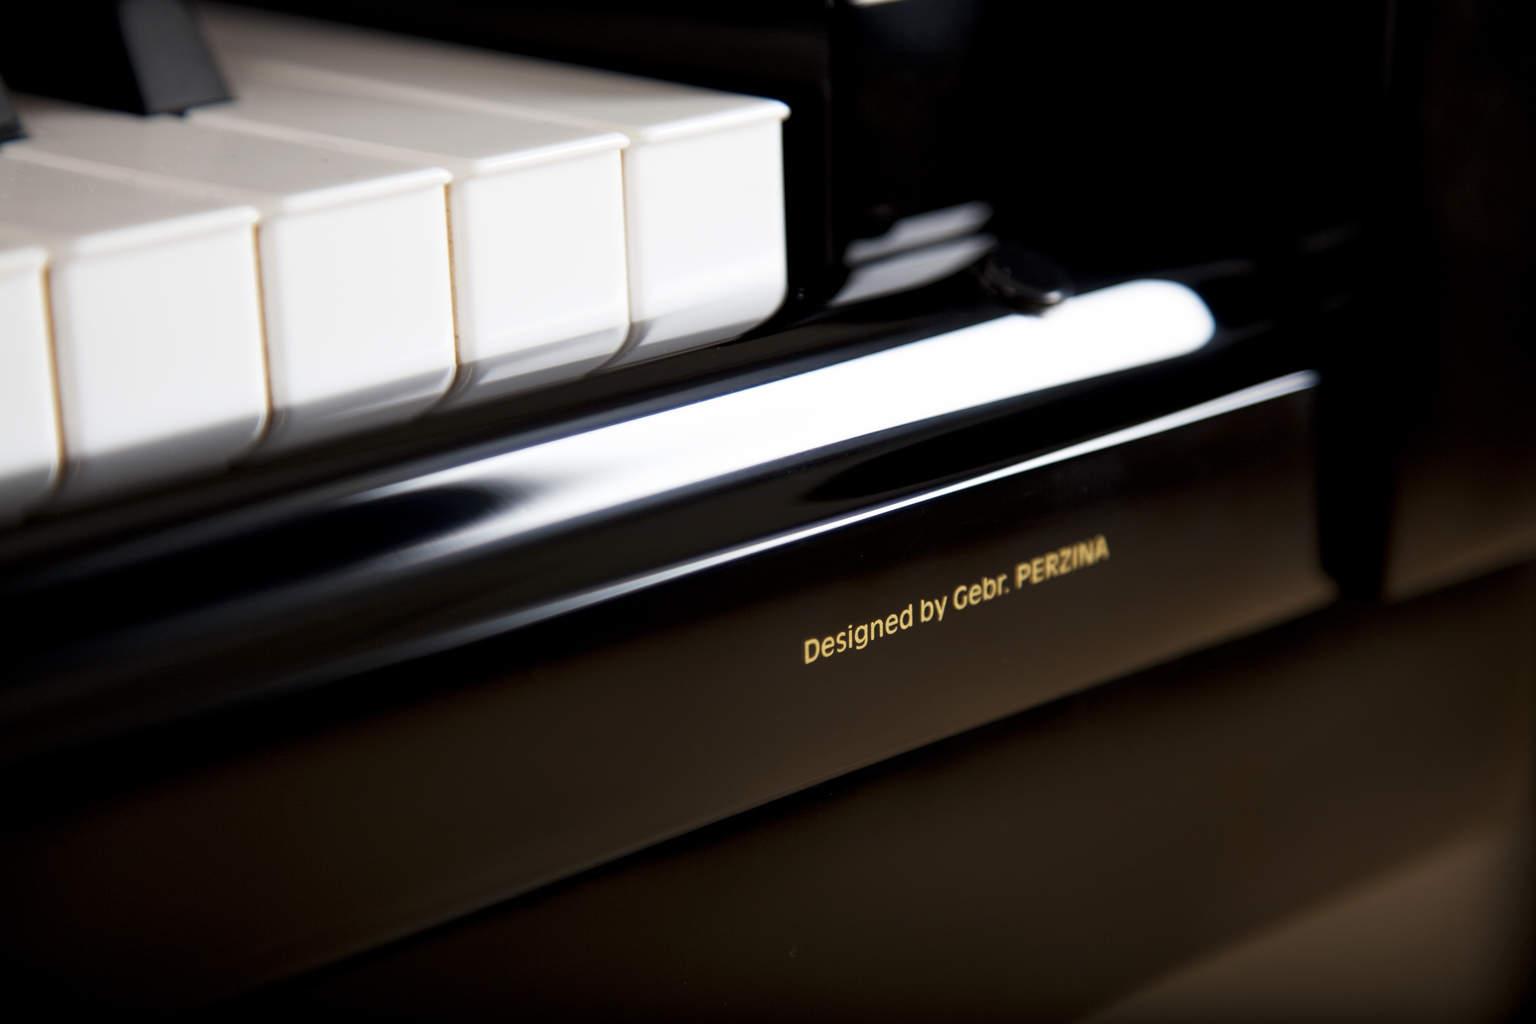 Used Gebr. Perzina 122 Upright Piano